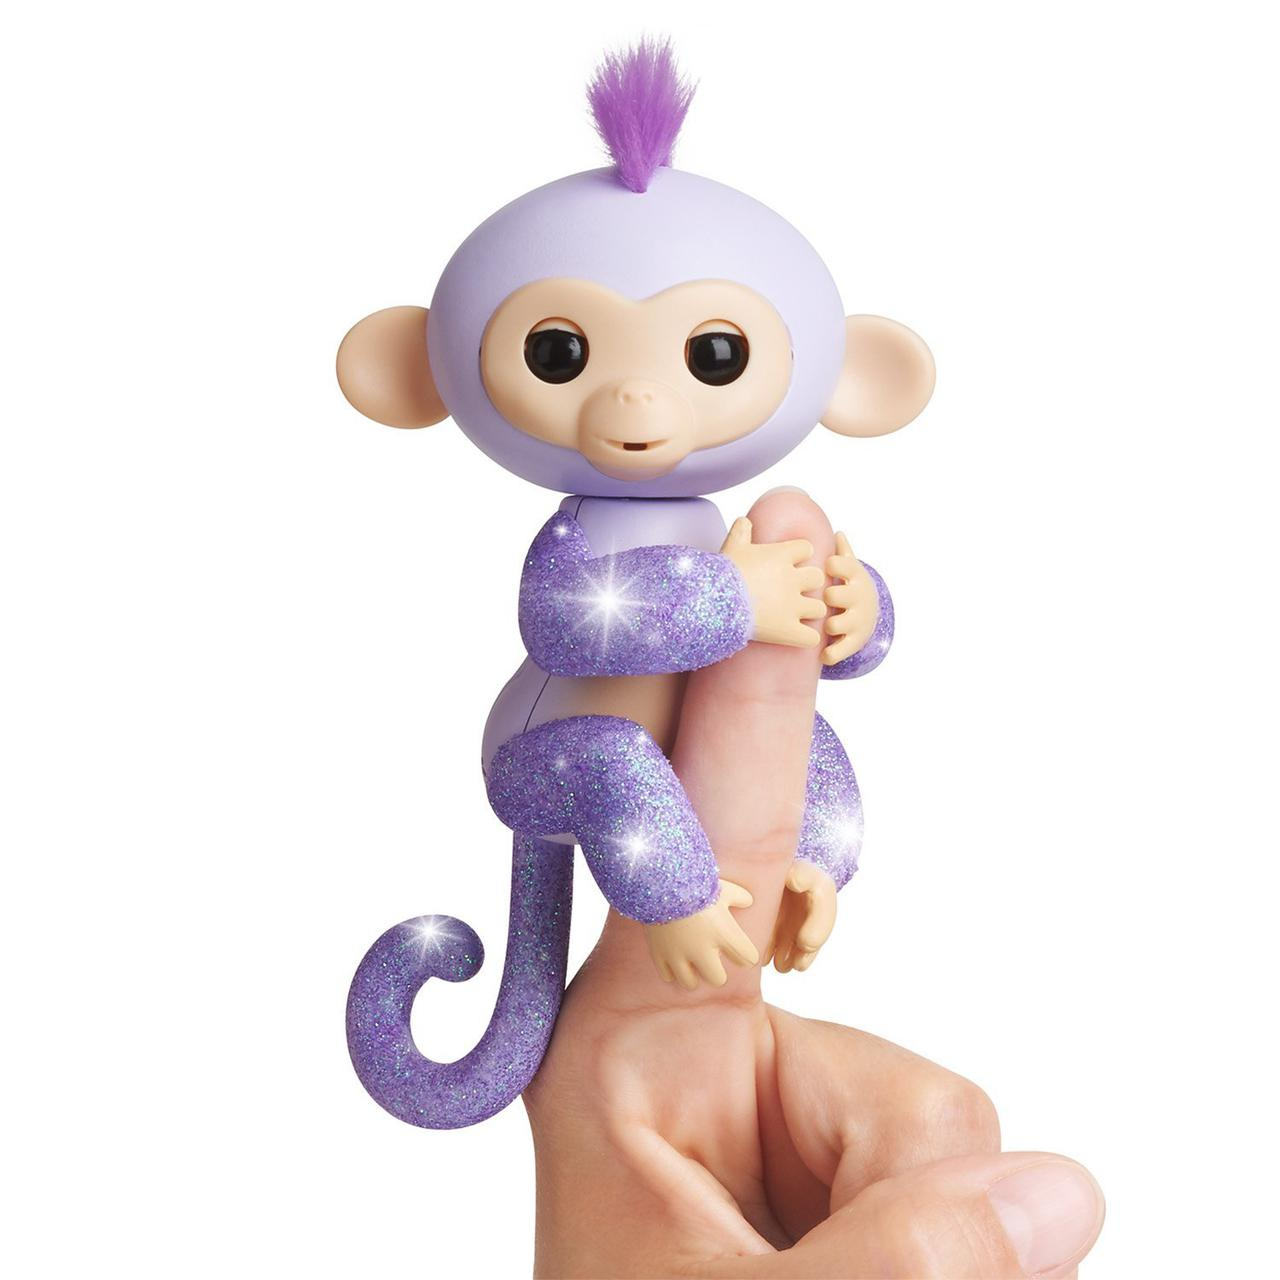 Интерактивная ручная обезьянка на пальчик, блестящая, WowWee Fingerlings Glitter Monkey  Оригинал из США